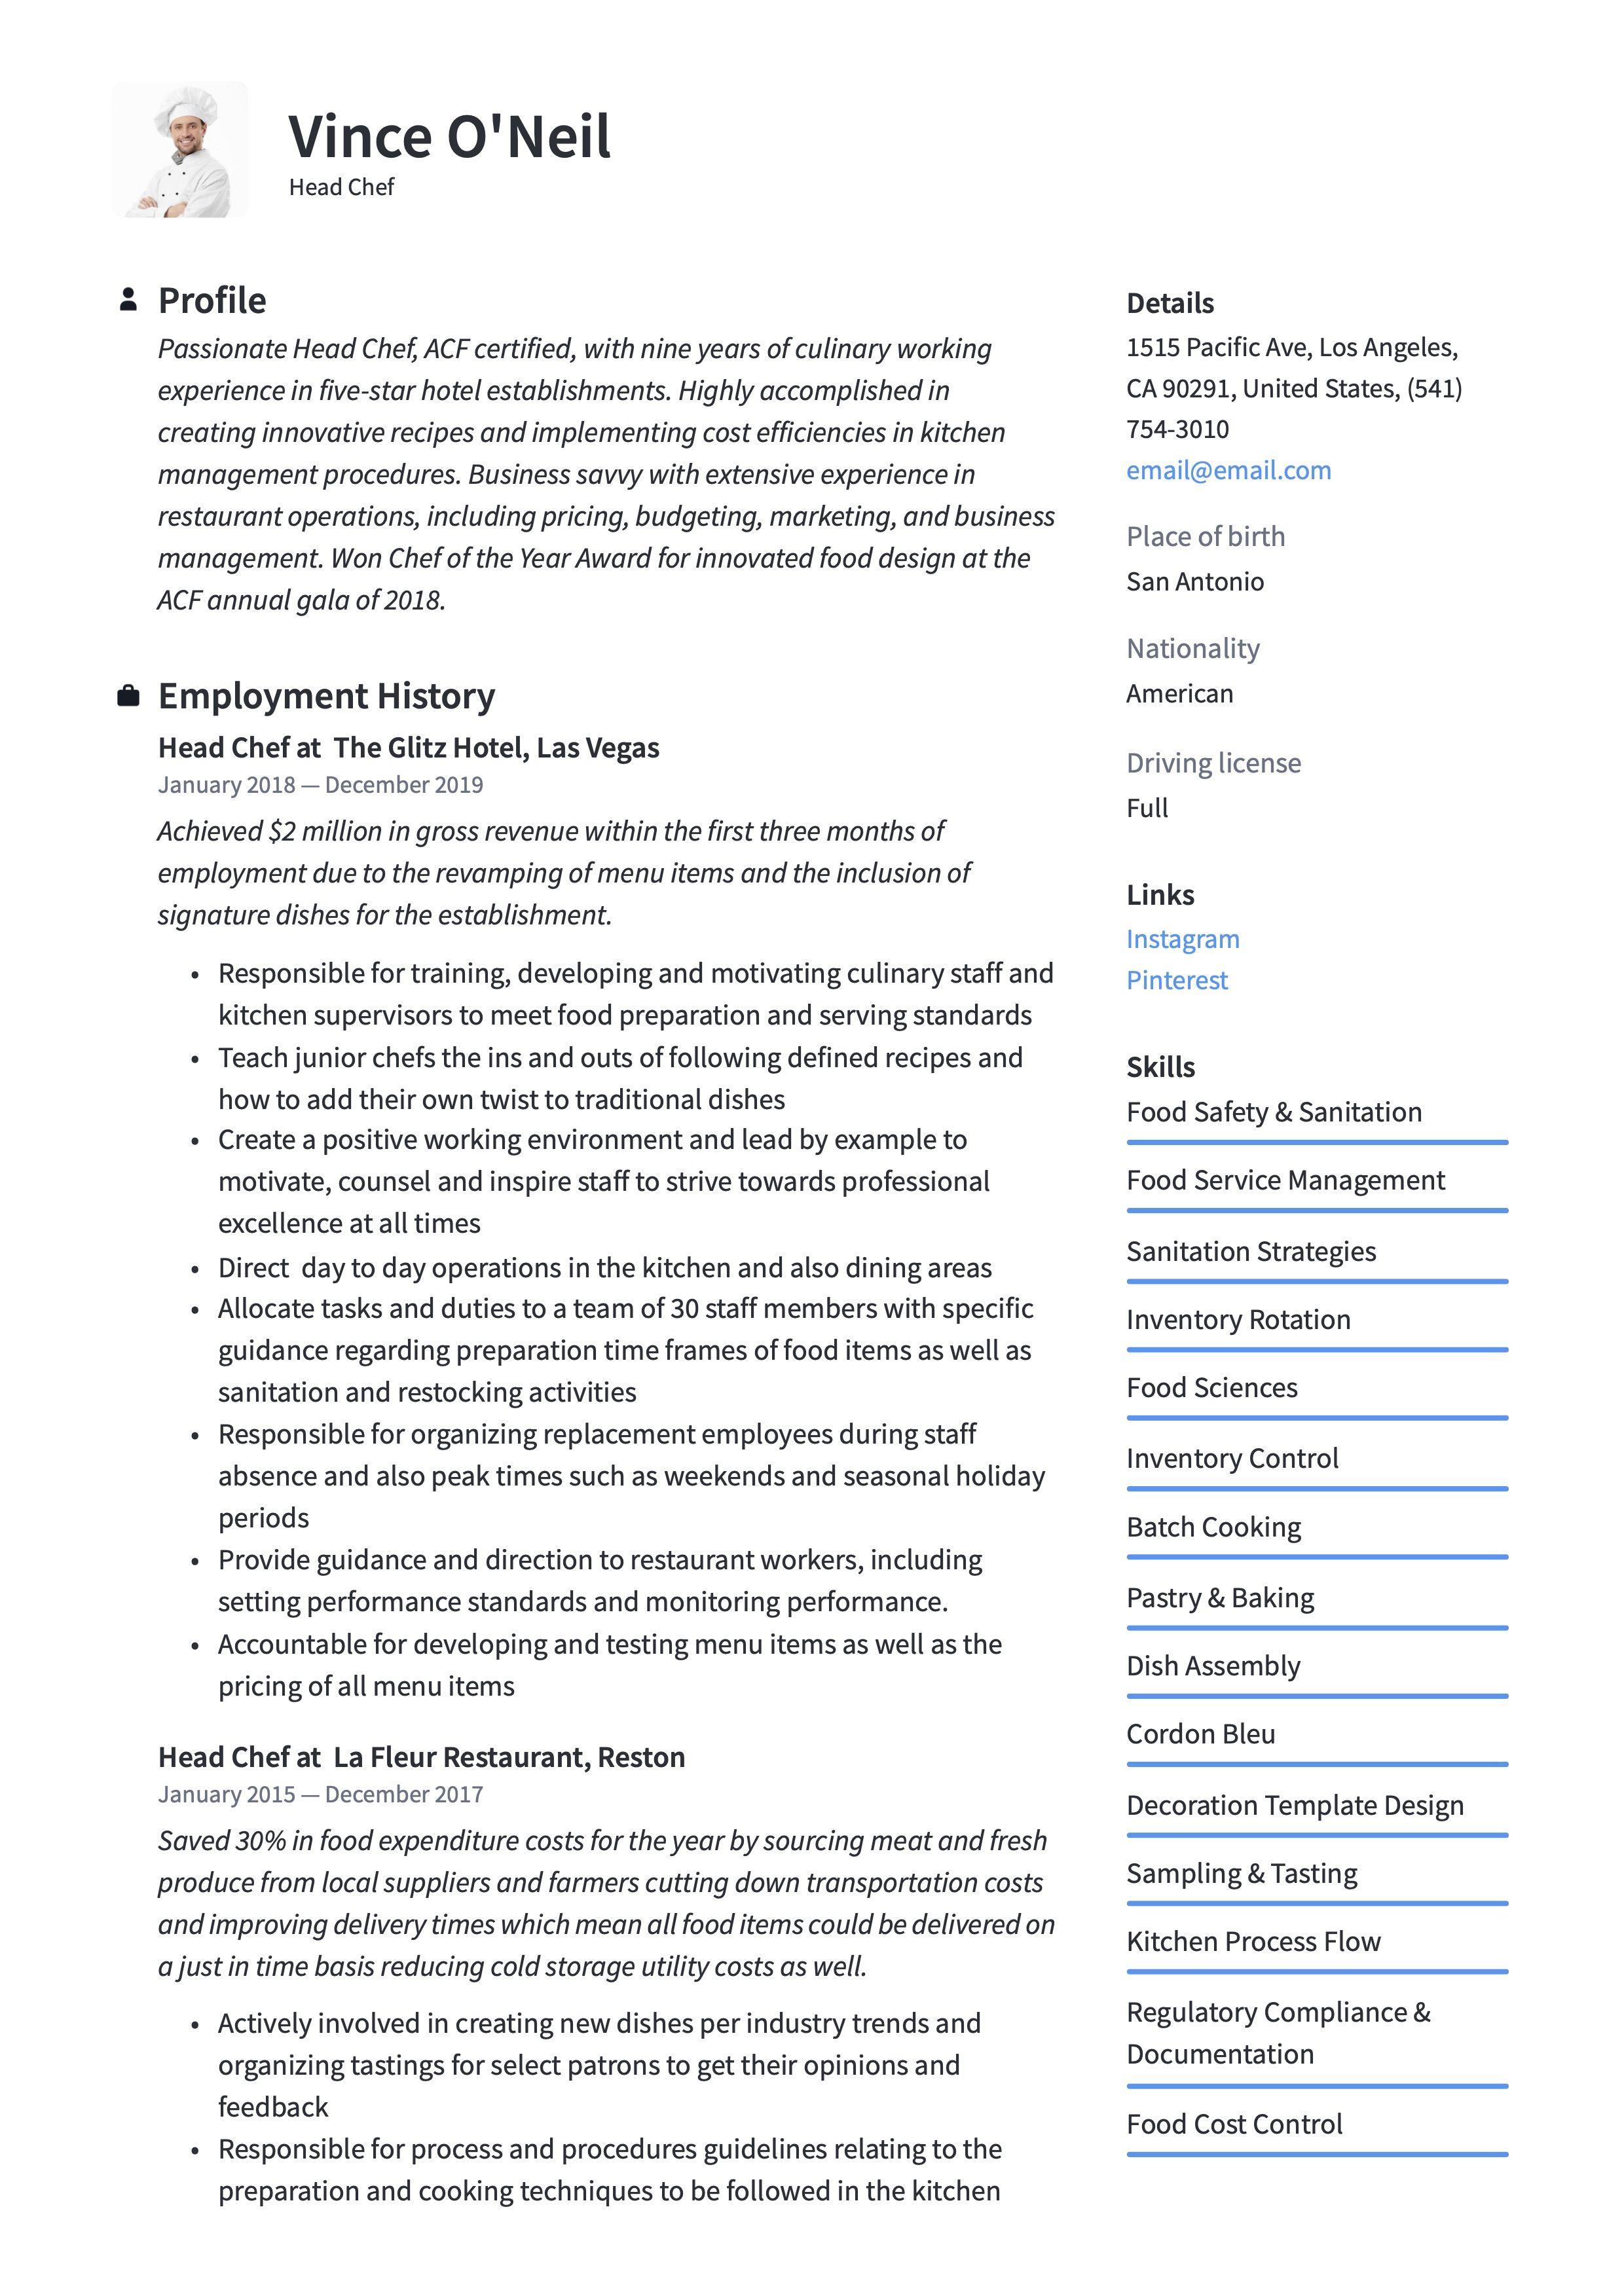 Head Chef Resume Sample Chef Resume Guided Writing Resume Writing